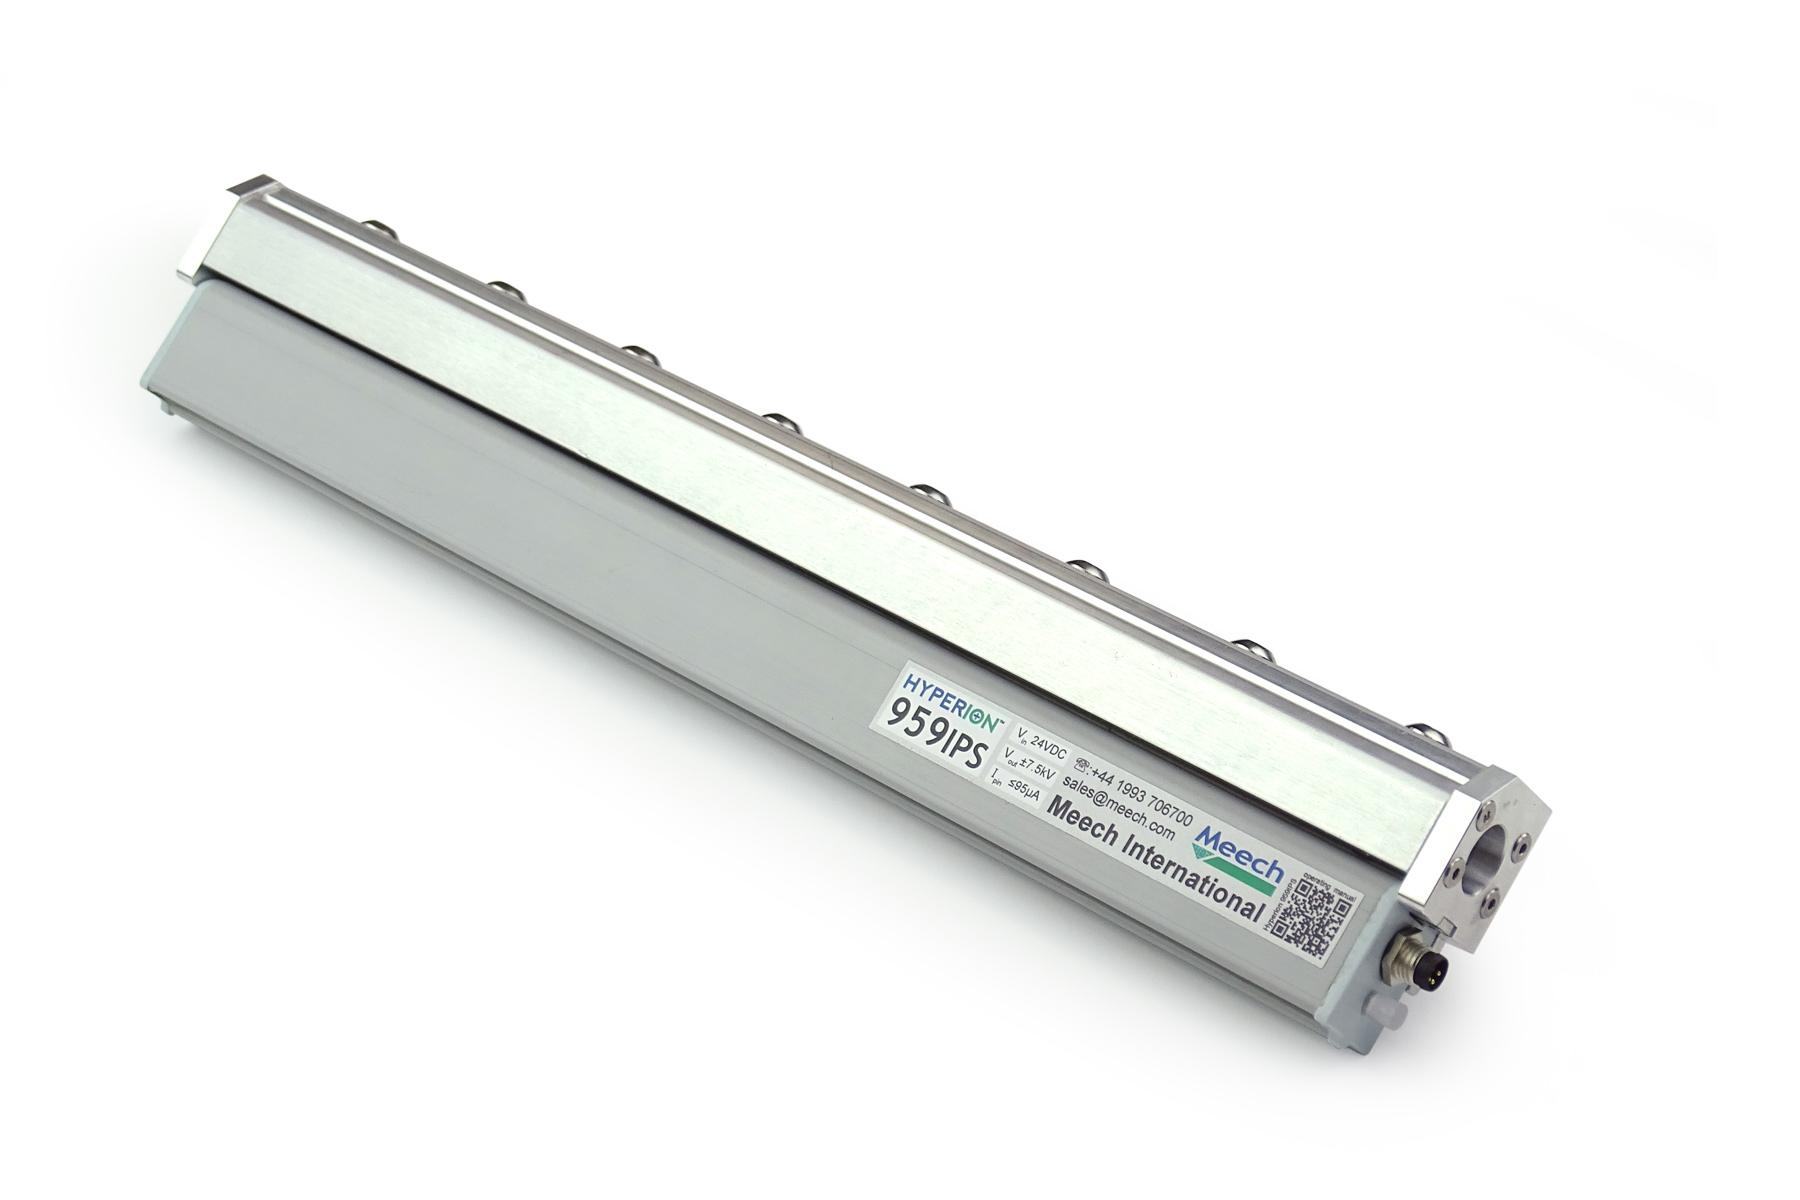 Hyperion 959IPS Ionizátor levegőfüggöny